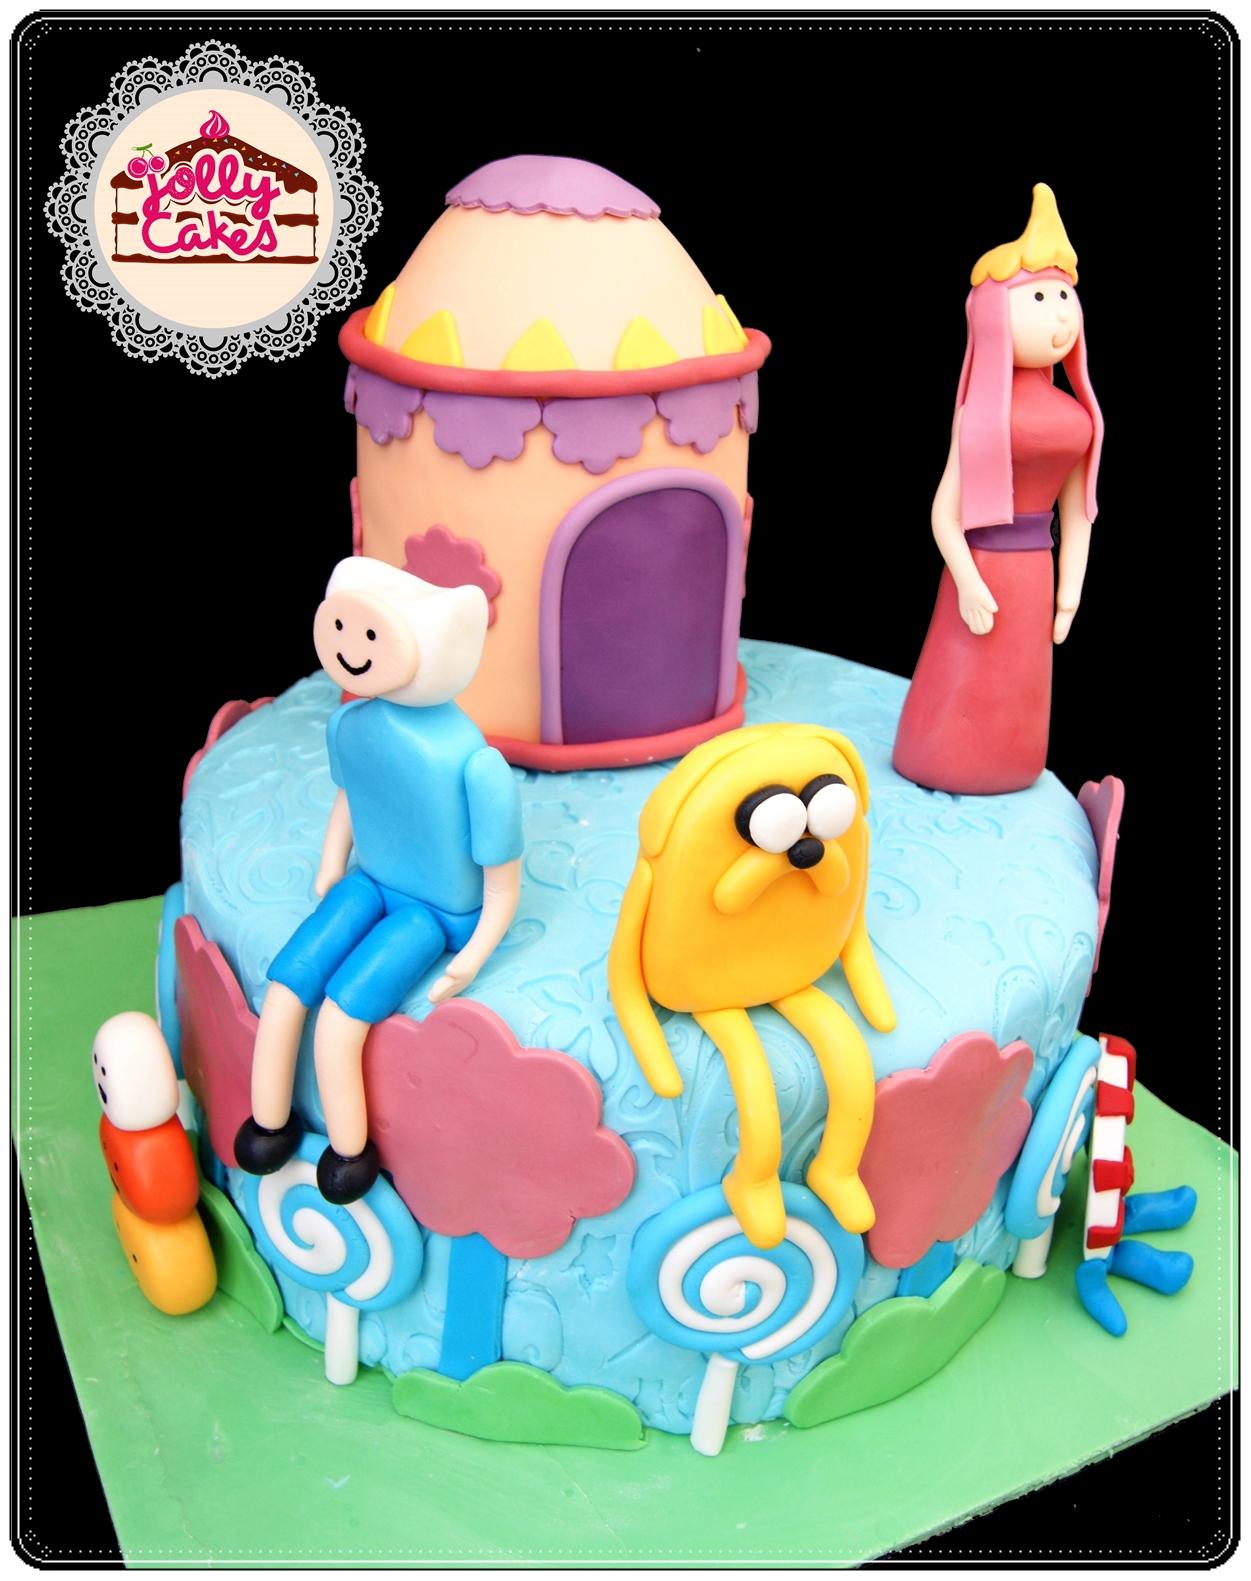 jolly cakes adventure time birthday cake for gwenn